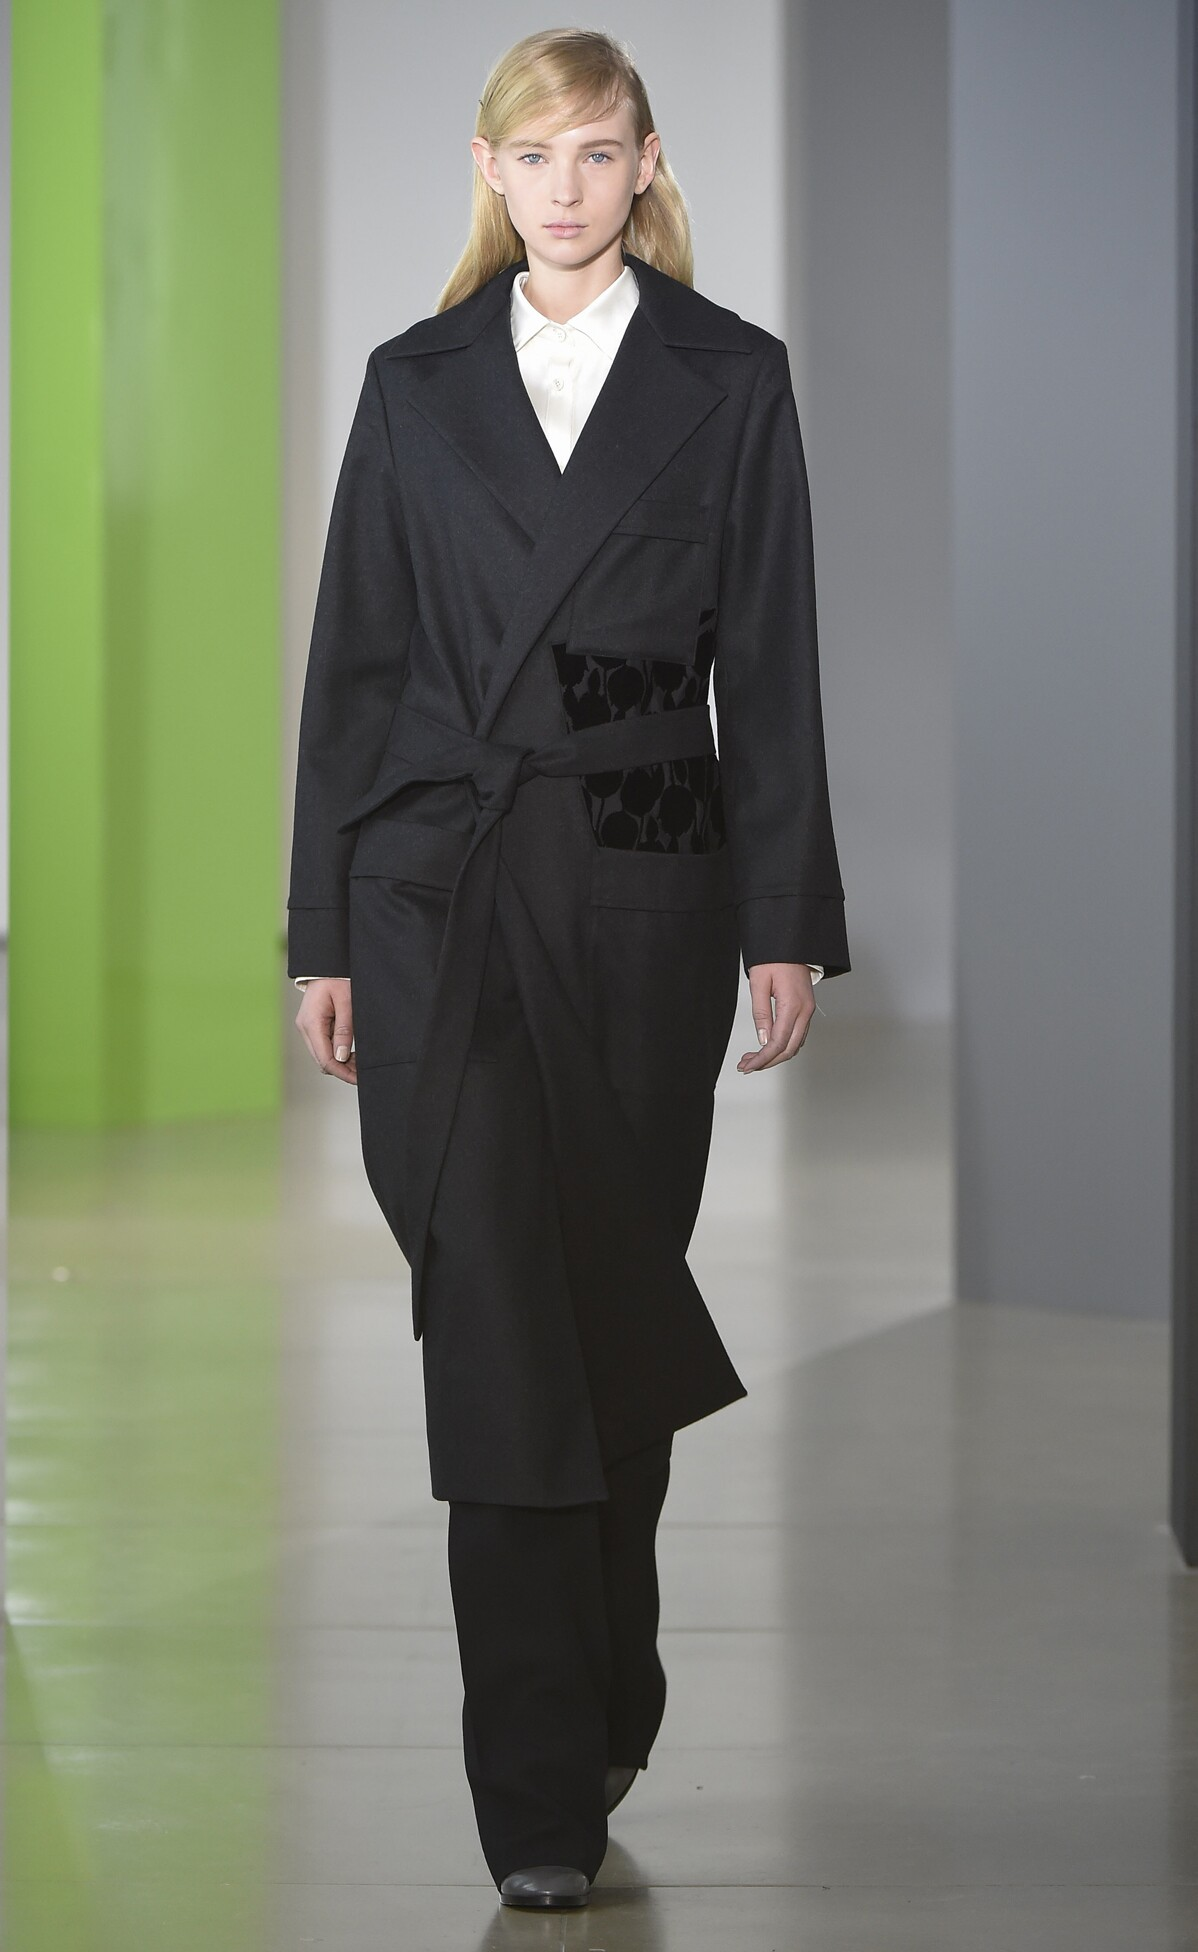 Jil Sander Fall Winter 2015 16 Women's Collection Milan Fashion Week